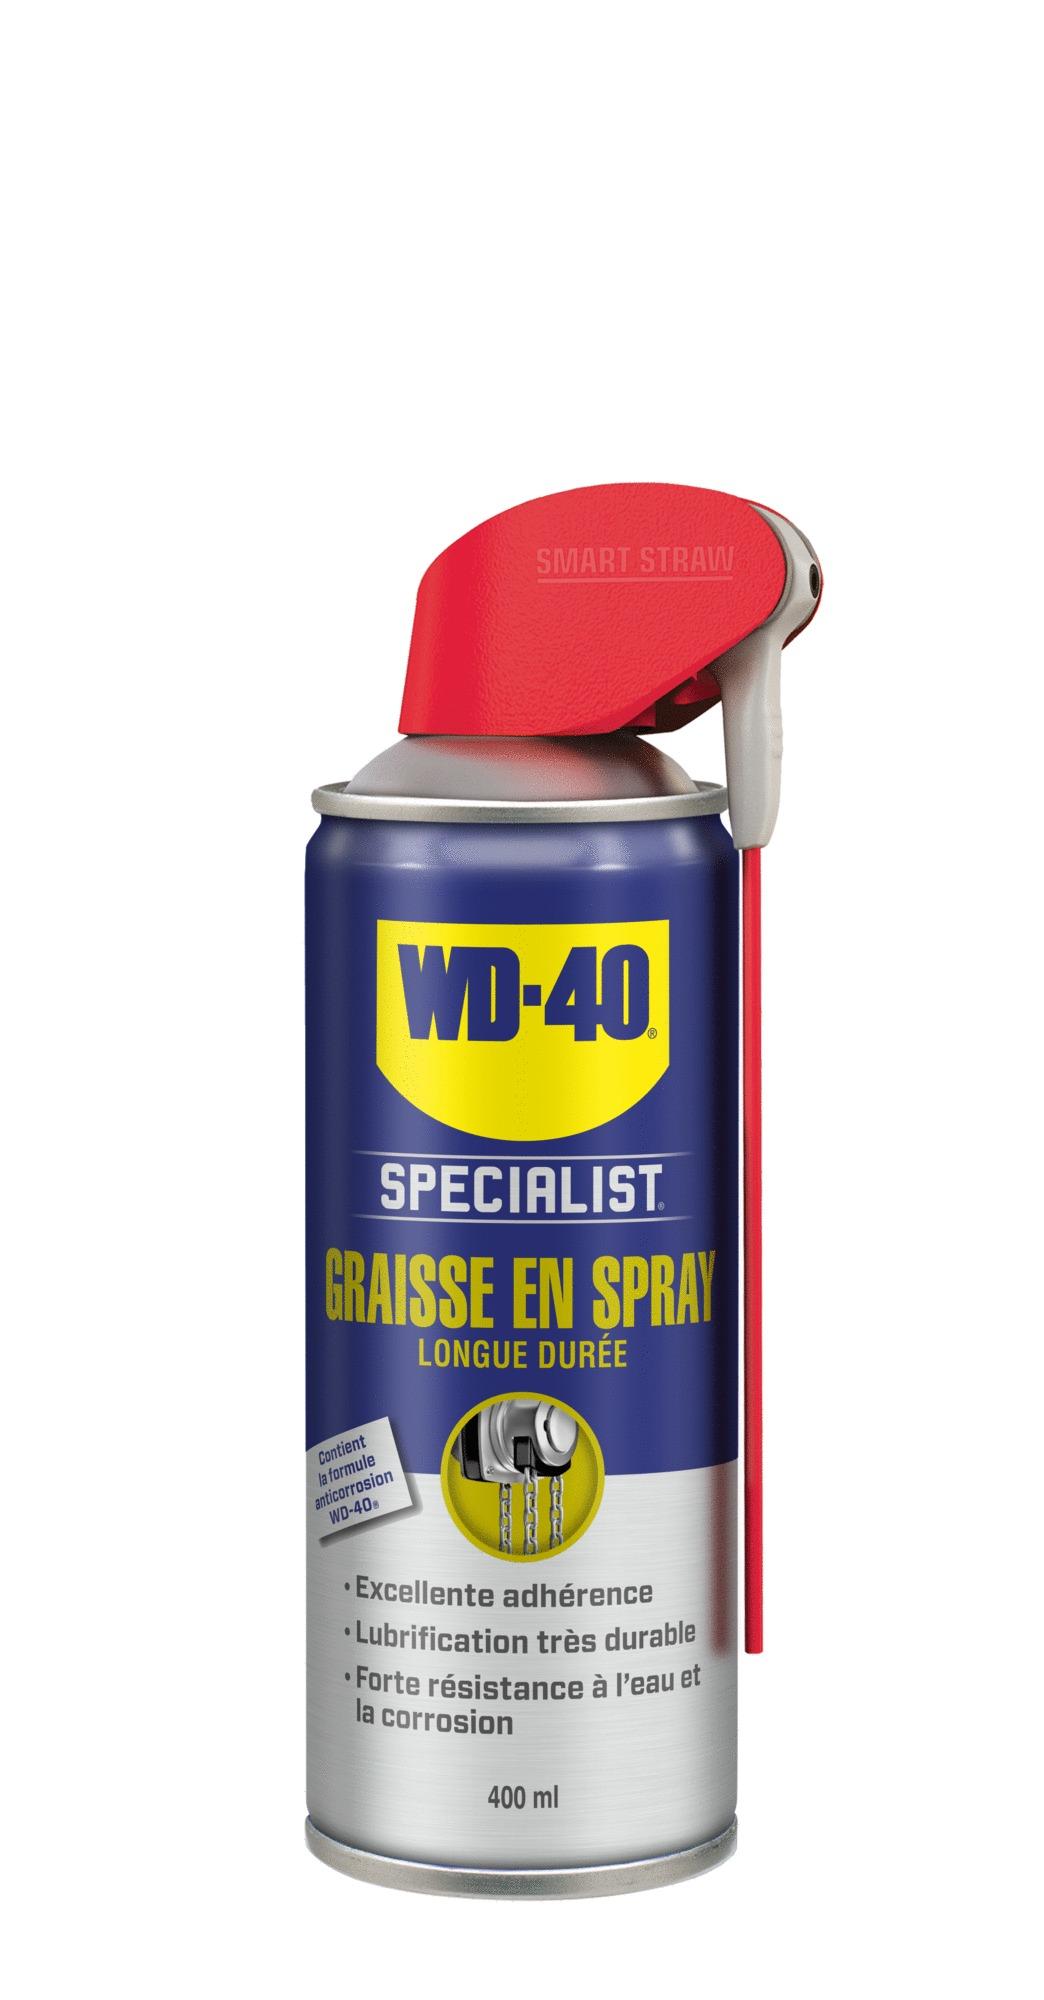 WD-40 SPECIALIST Graisse spray longue durée 400ML - WD-40 SPECIALIST PRO - 33217